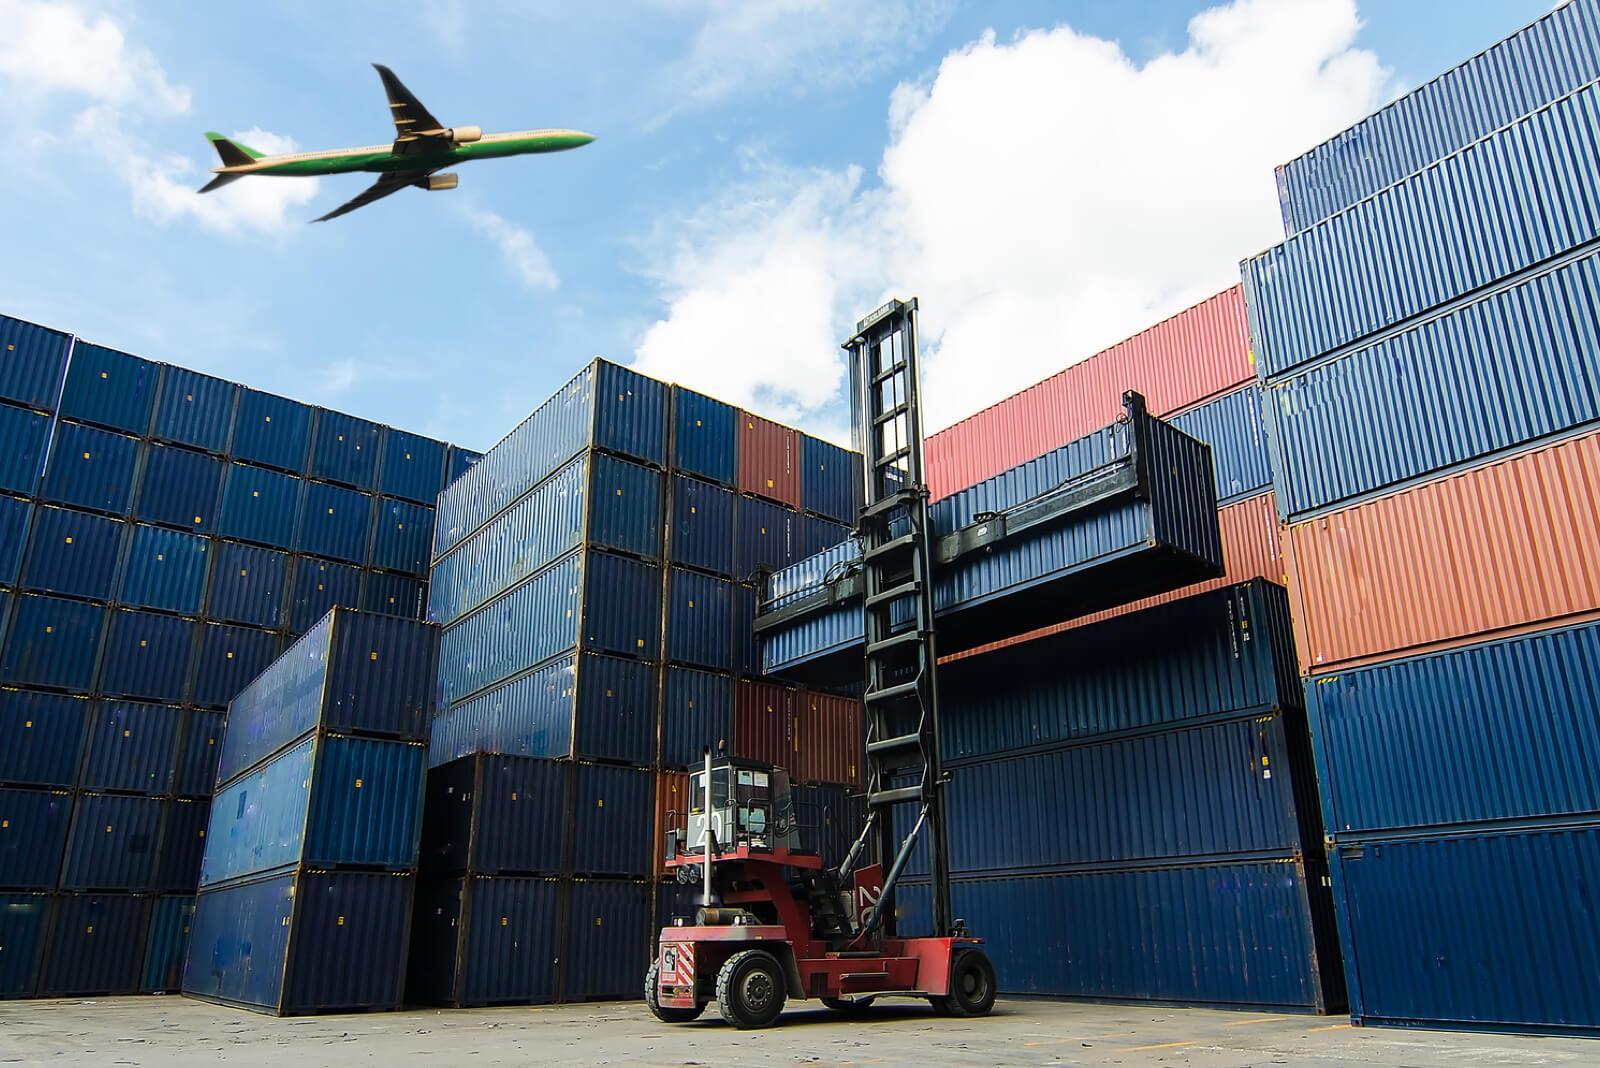 Global Logistics provider gains revenue